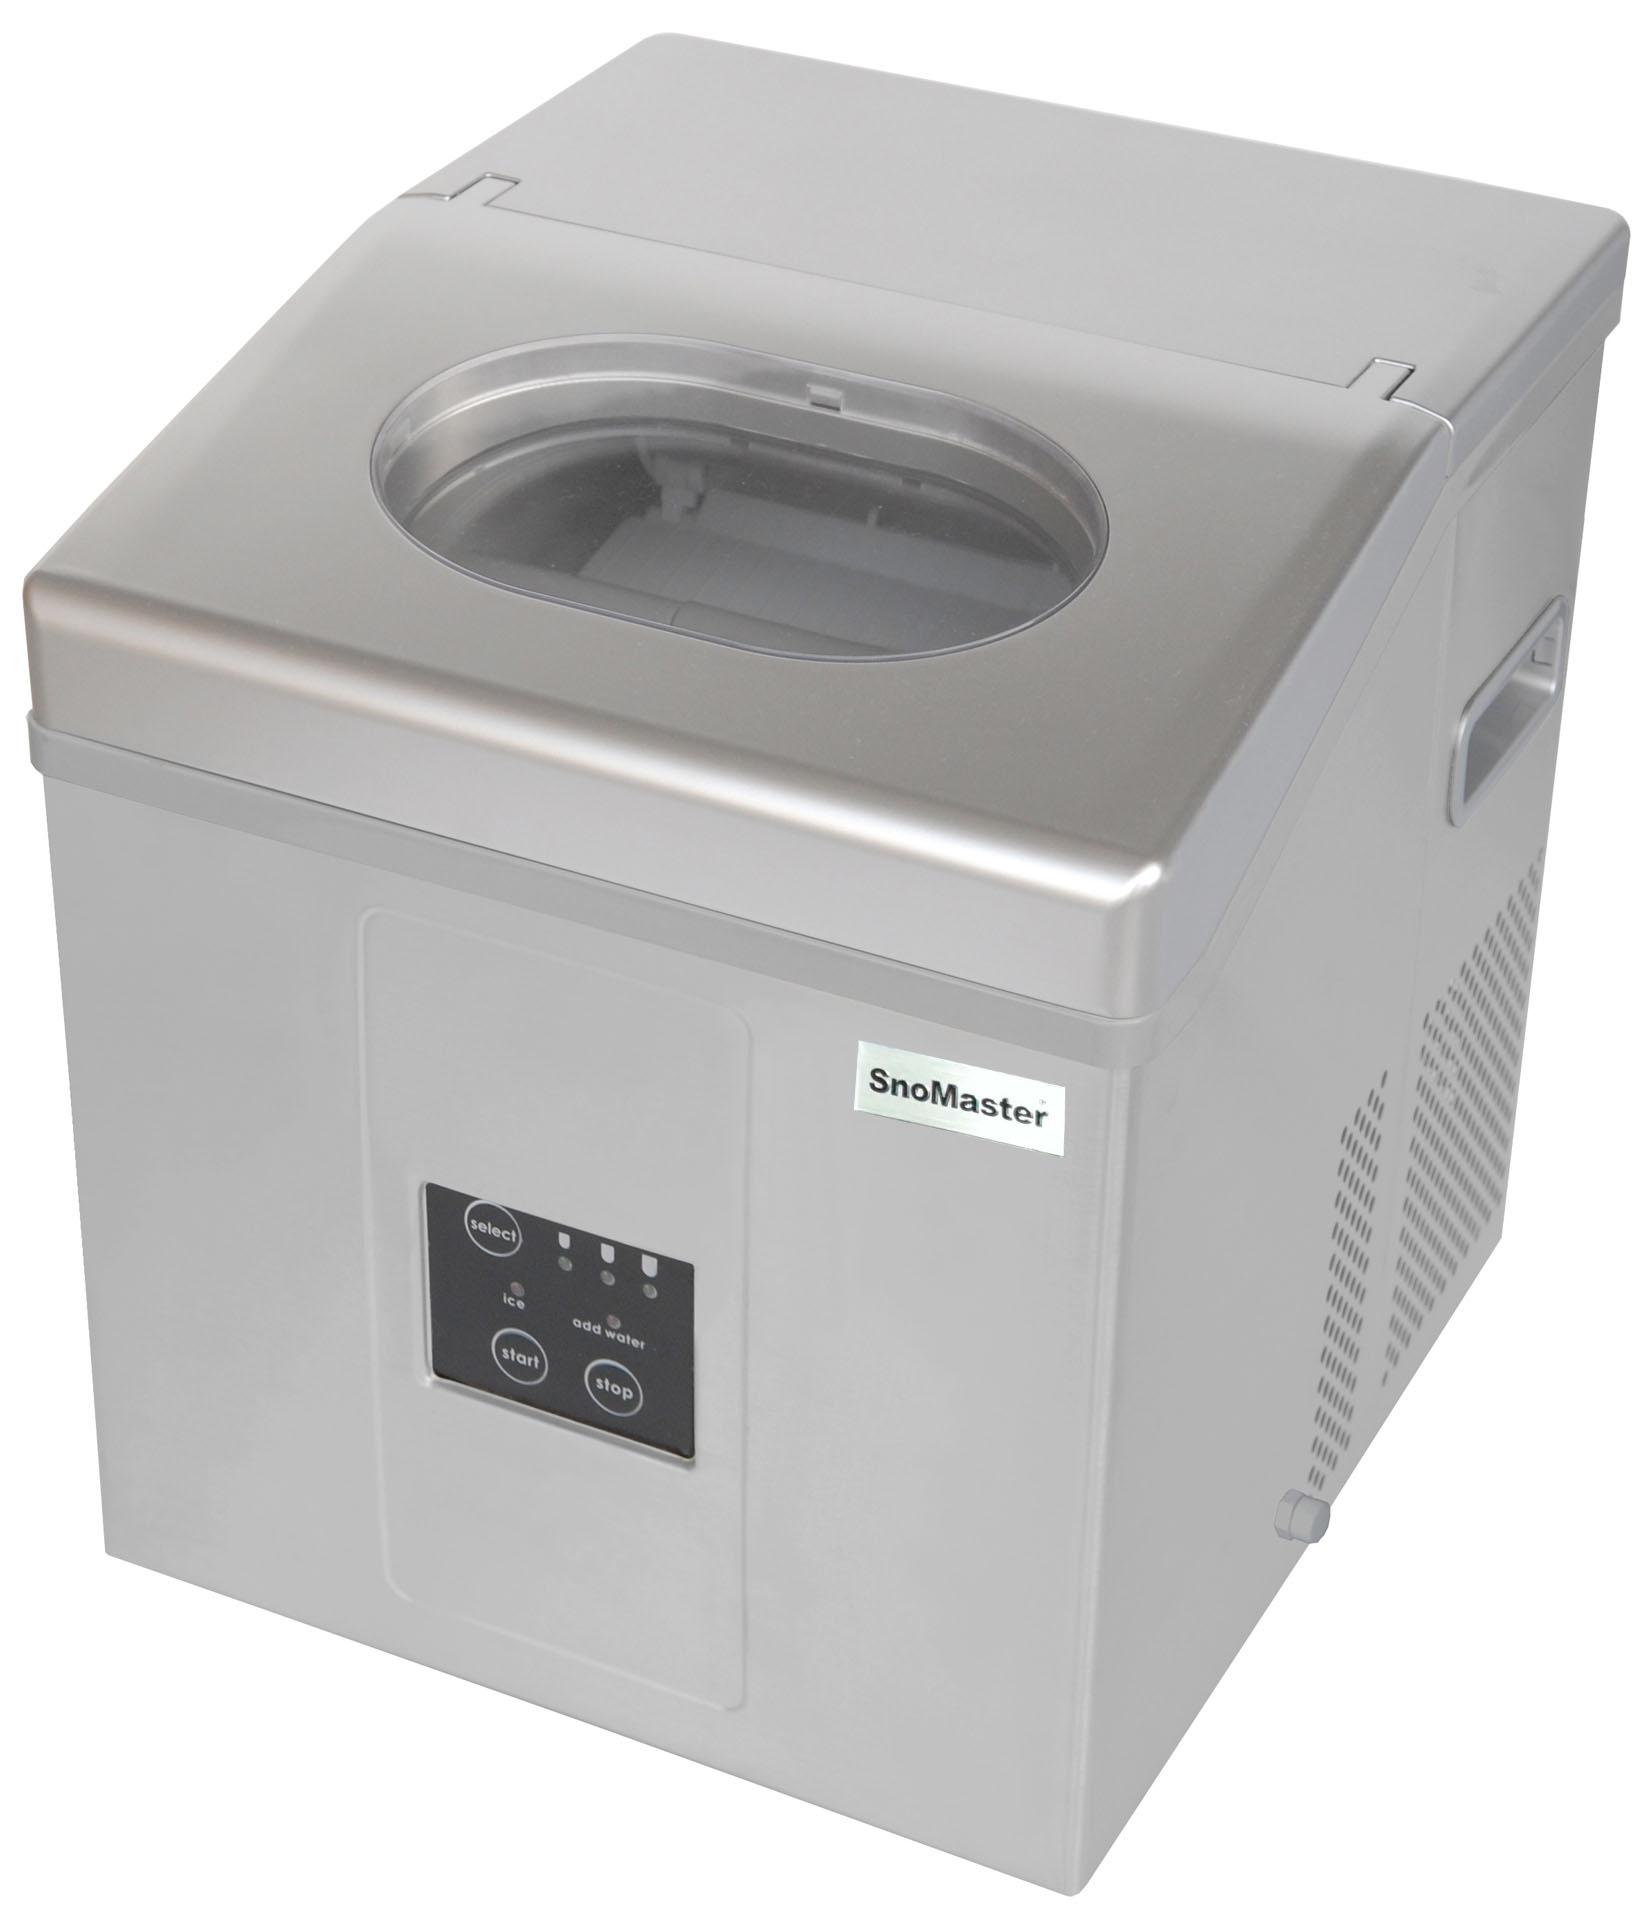 snomaster-domestic-ice-maker-zbc-15-portable-ice-maker